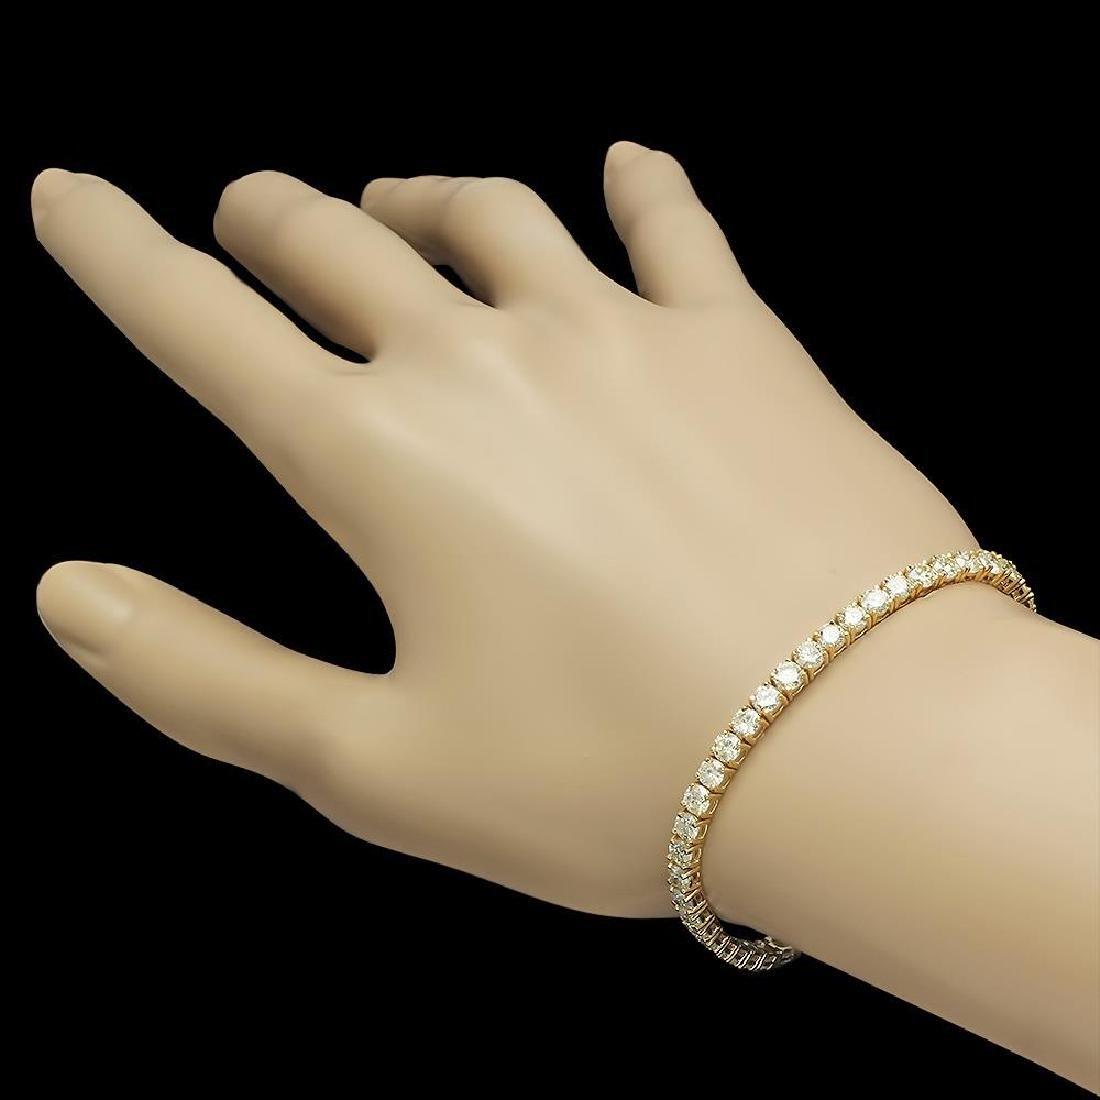 18K Gold 7.85ct Diamond Bracelet - 2